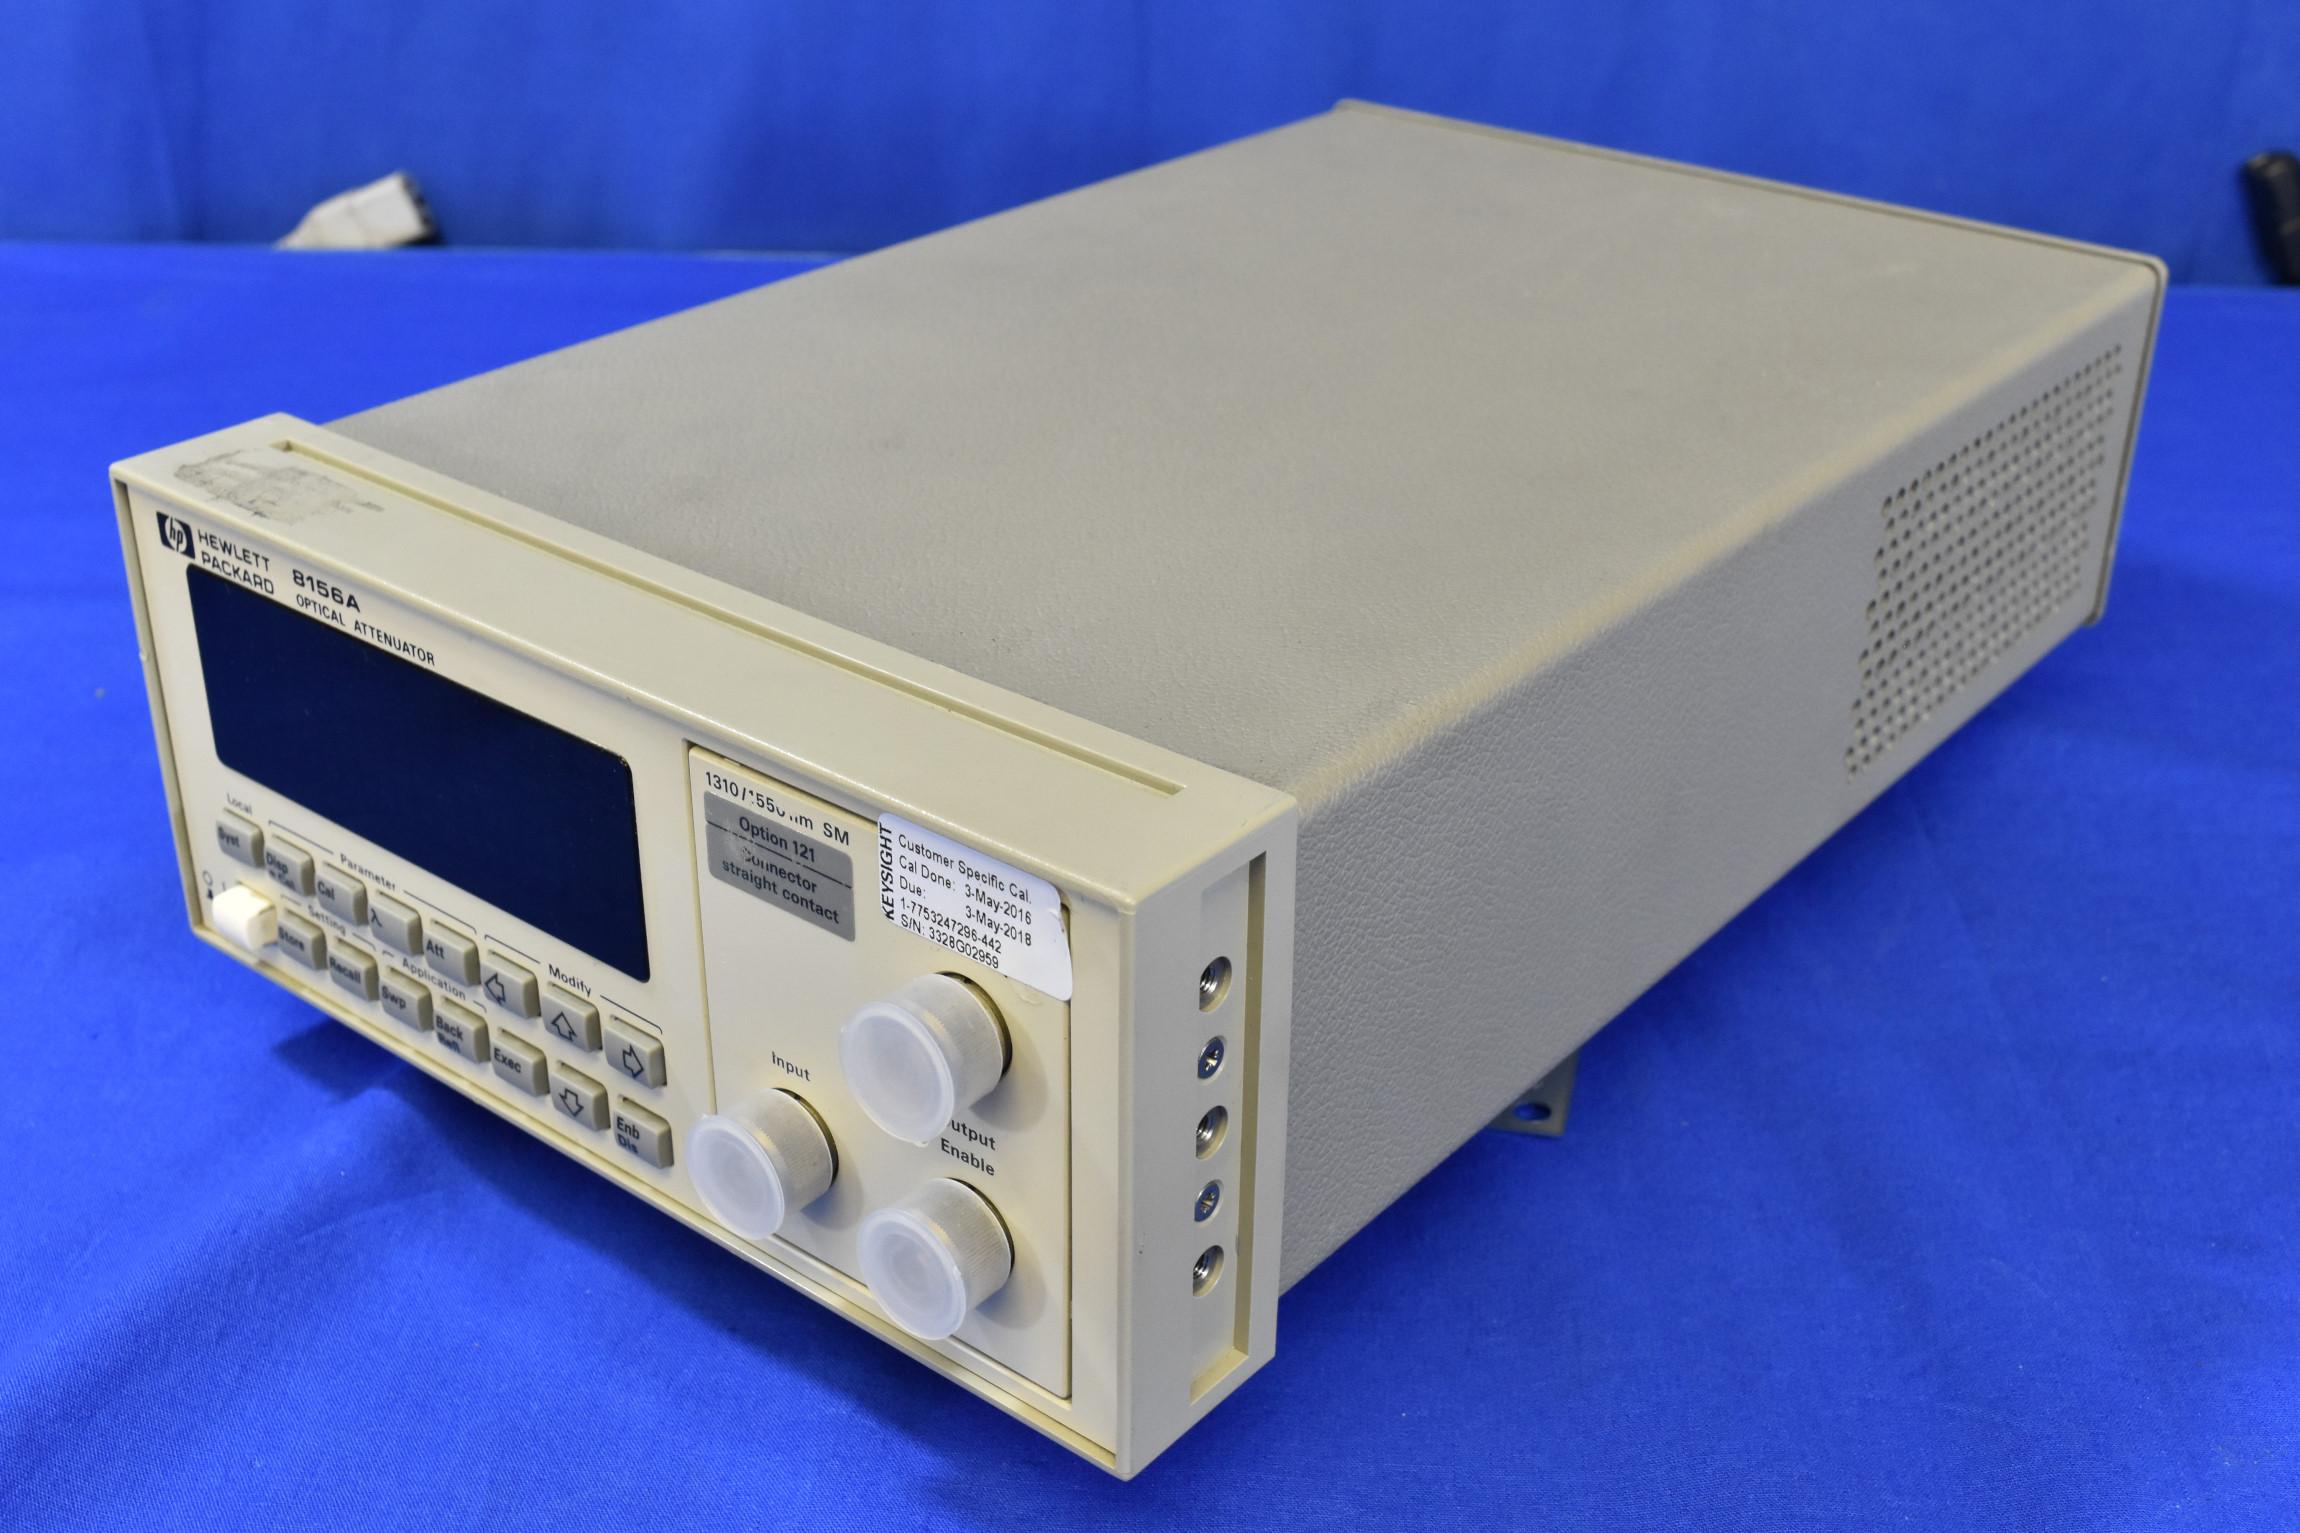 SN 590_005